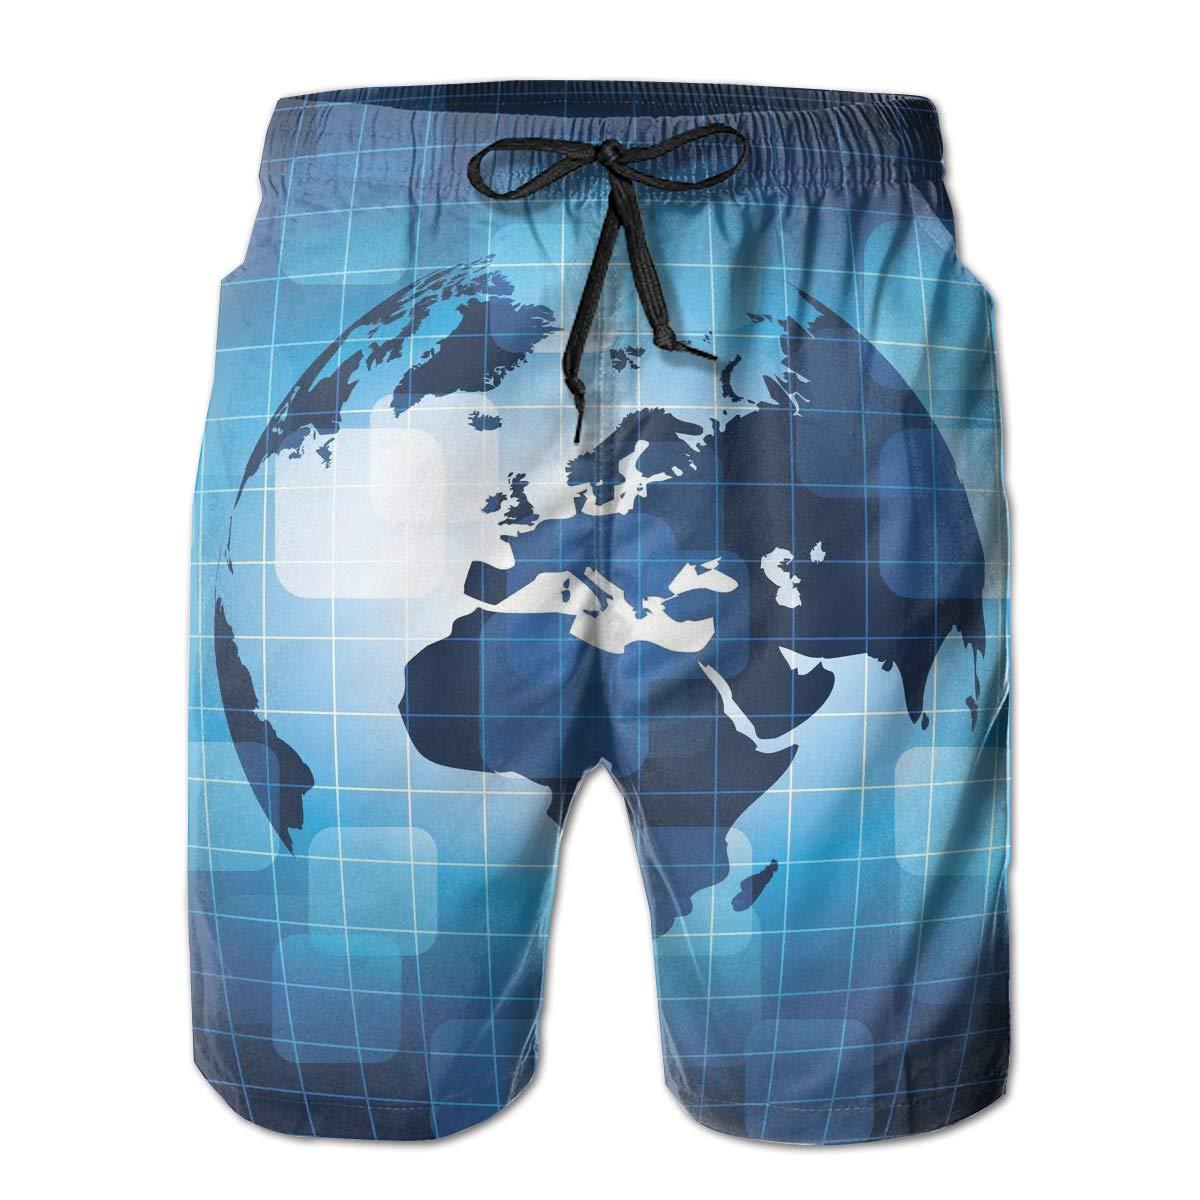 Mens Beach Shorts Quick Dry Blue Earth Summer Holiday Mesh Lining Swimwear Board Shorts with Pockets